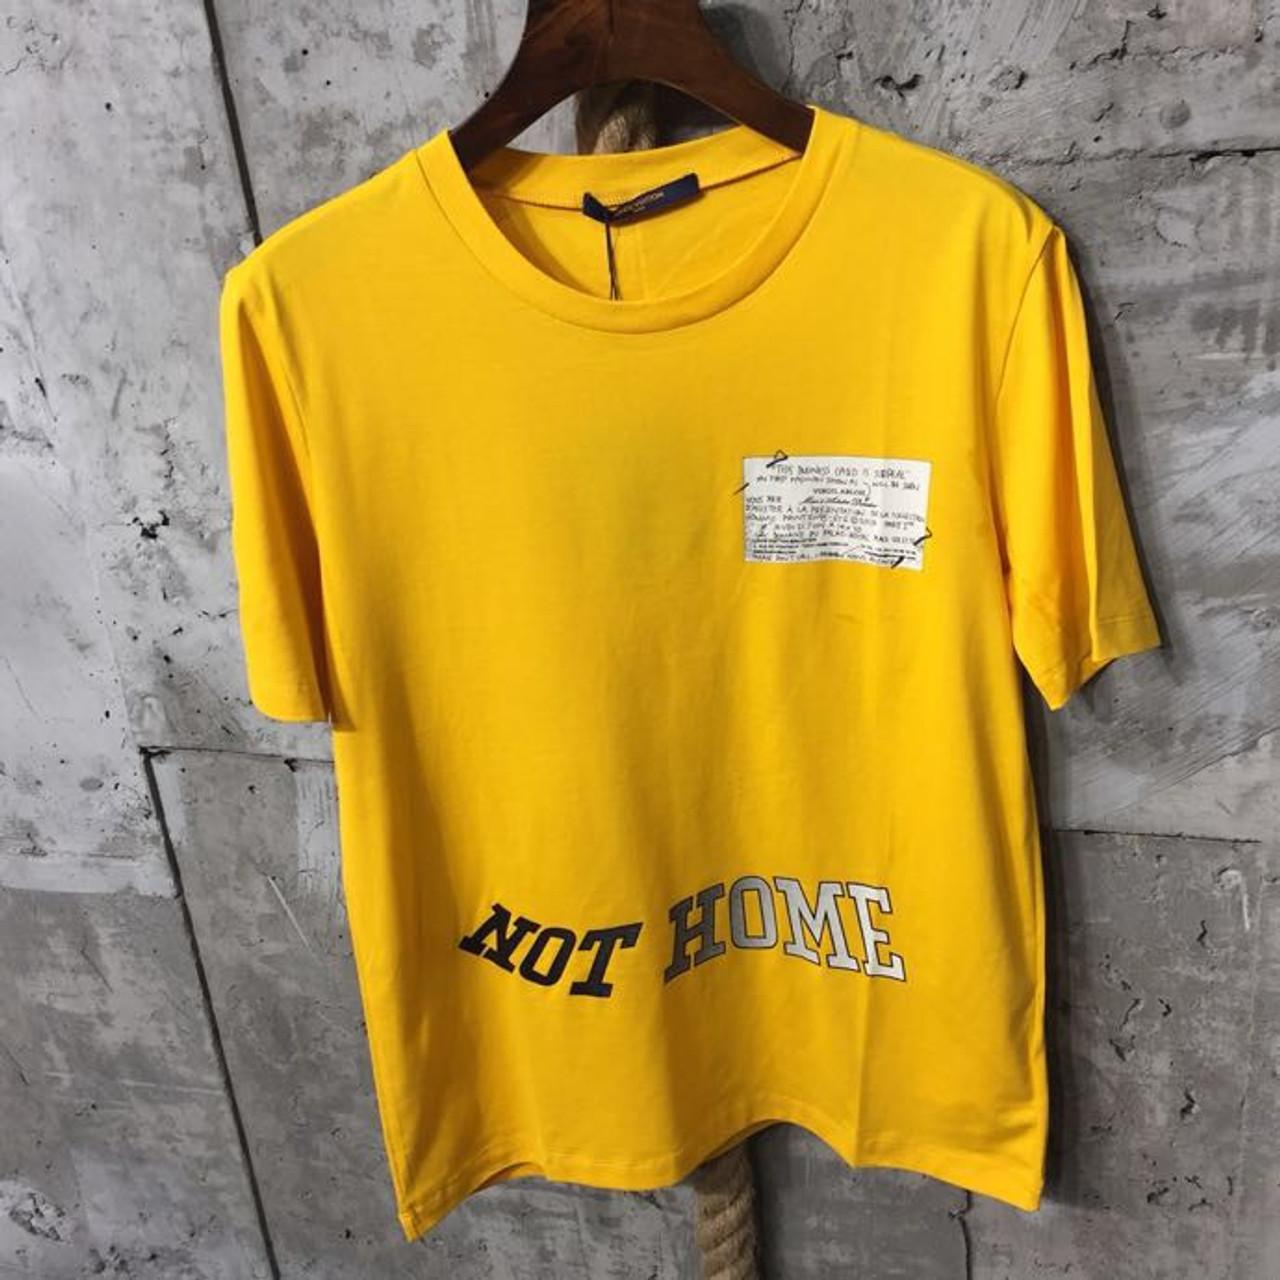 b767fdb5 Louis Vuitton x Virgil Abloh June 21st 2018 Not Home Street Style T-Shirt  Mens